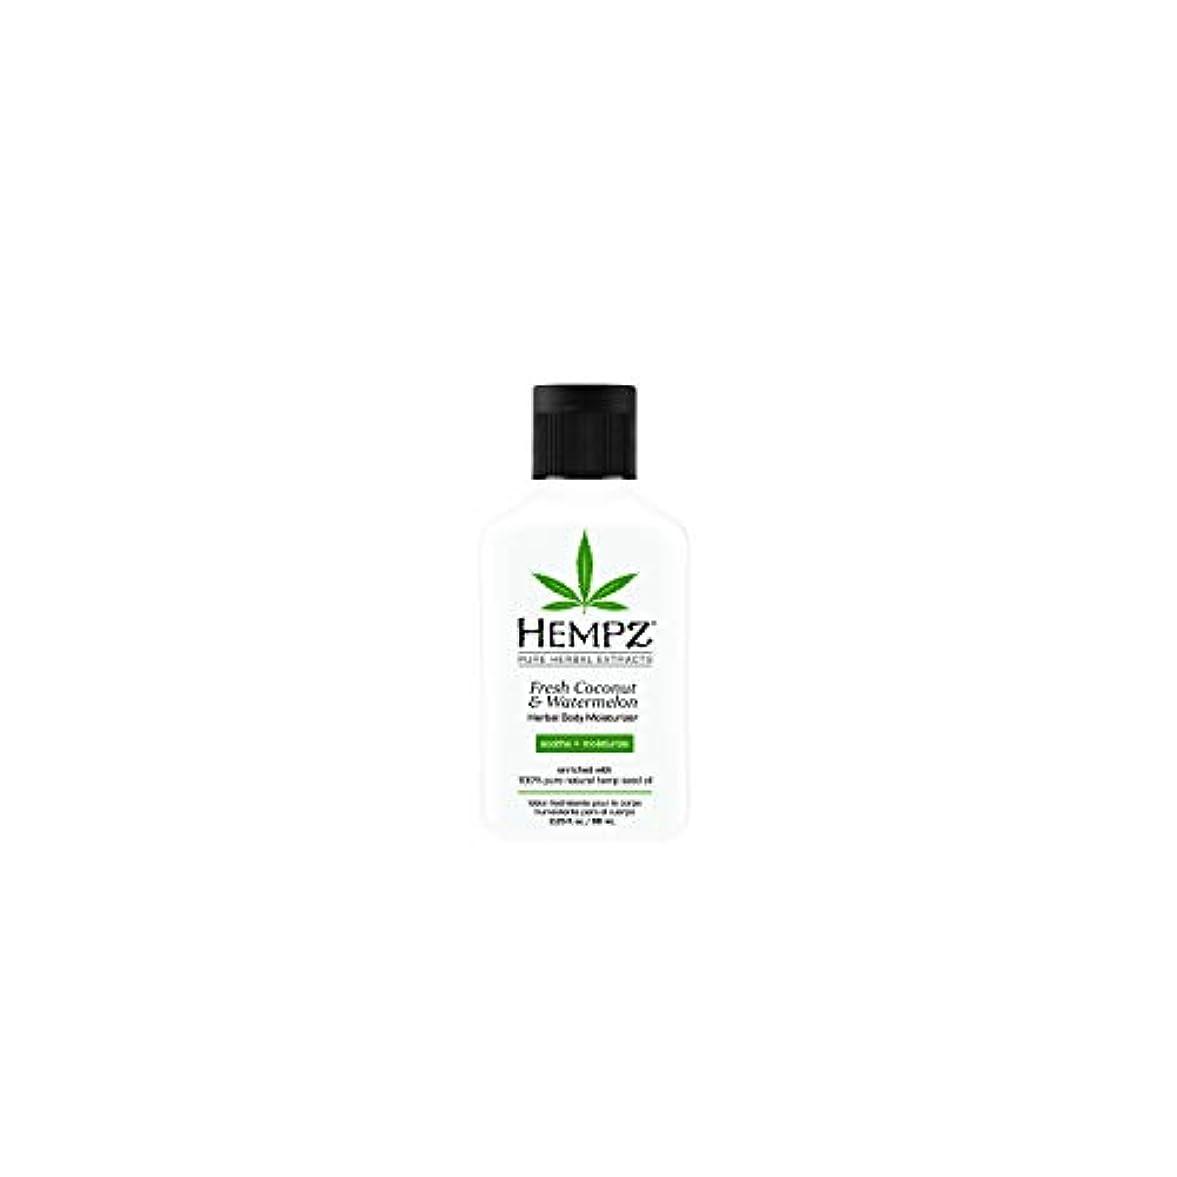 真向こう官僚東Hempz Herbal Body Moisturizer, Pearl White, Fresh Coconut/Watermelon, 2.25 Ounce by Hempz